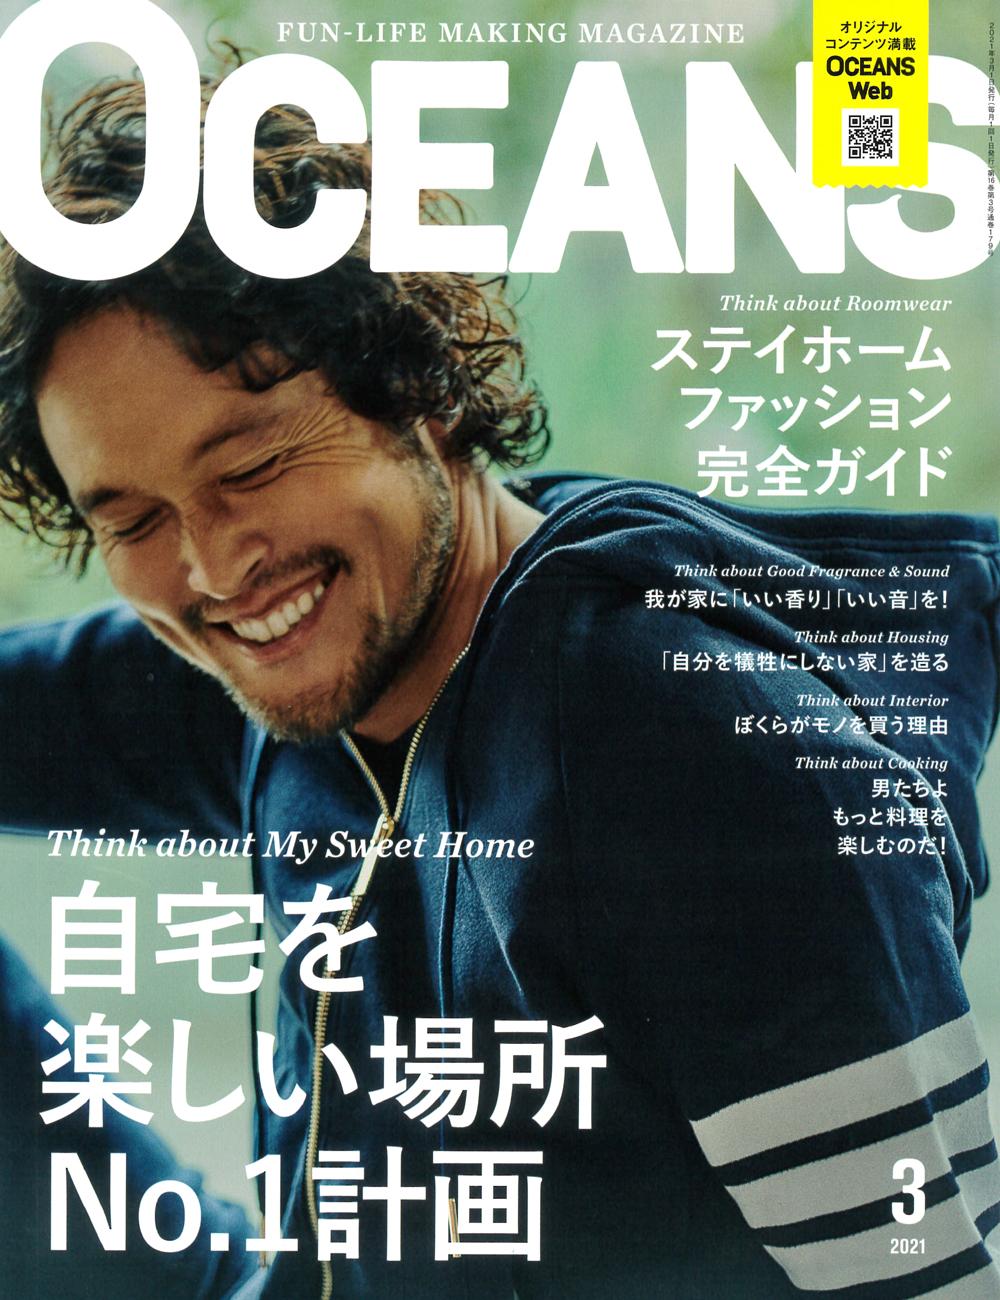 OCEANS3月号掲載情報:BN3TH